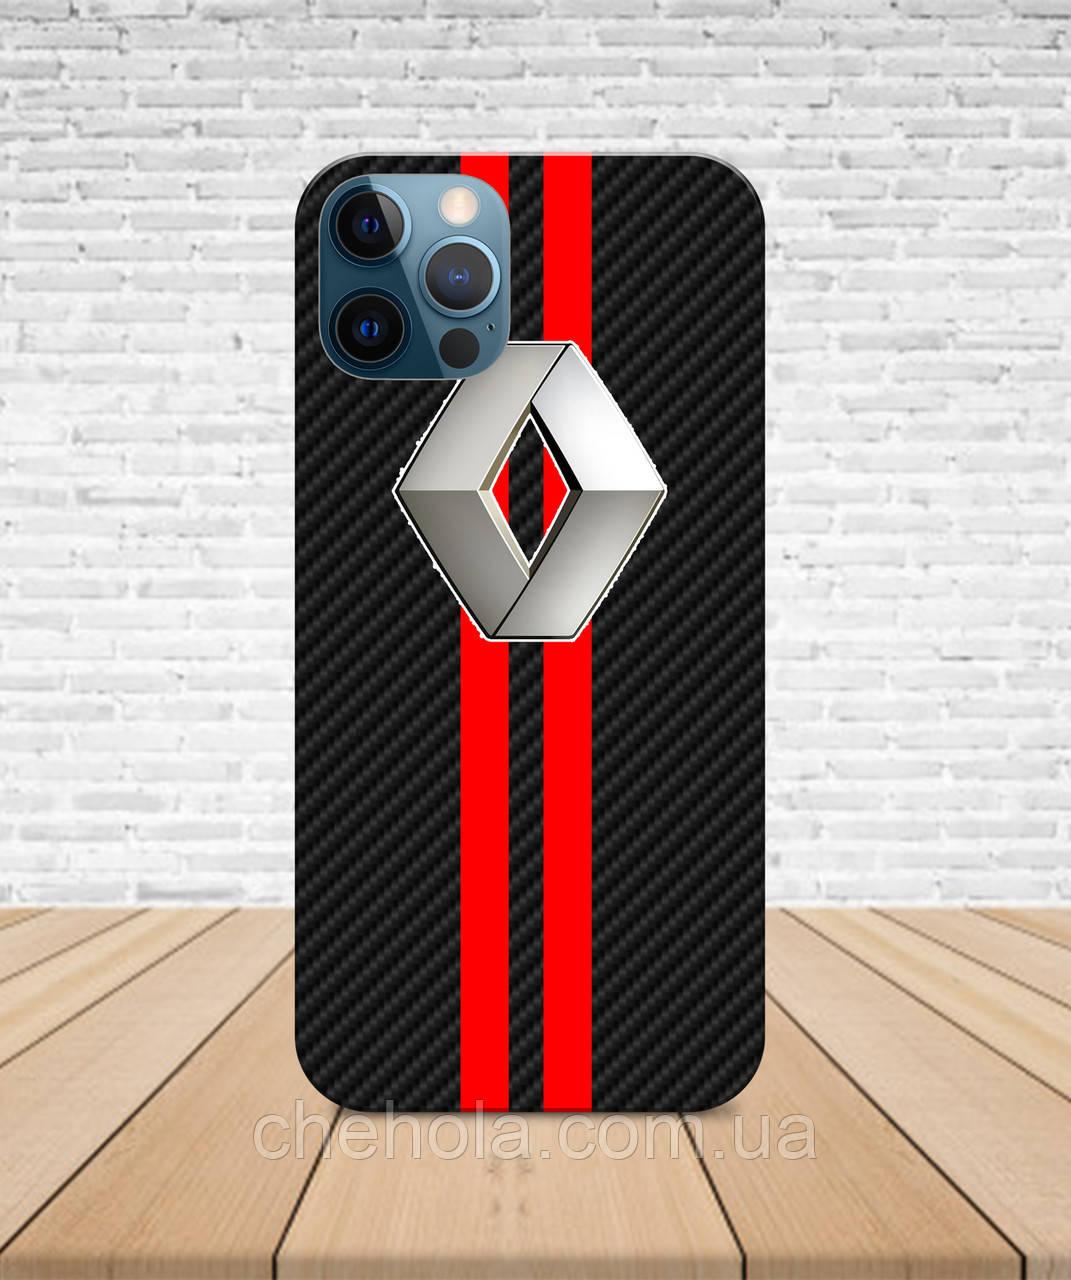 Матовый Чехол iPhone 12 Pro Max Mini карбон Чехол renault с принтом